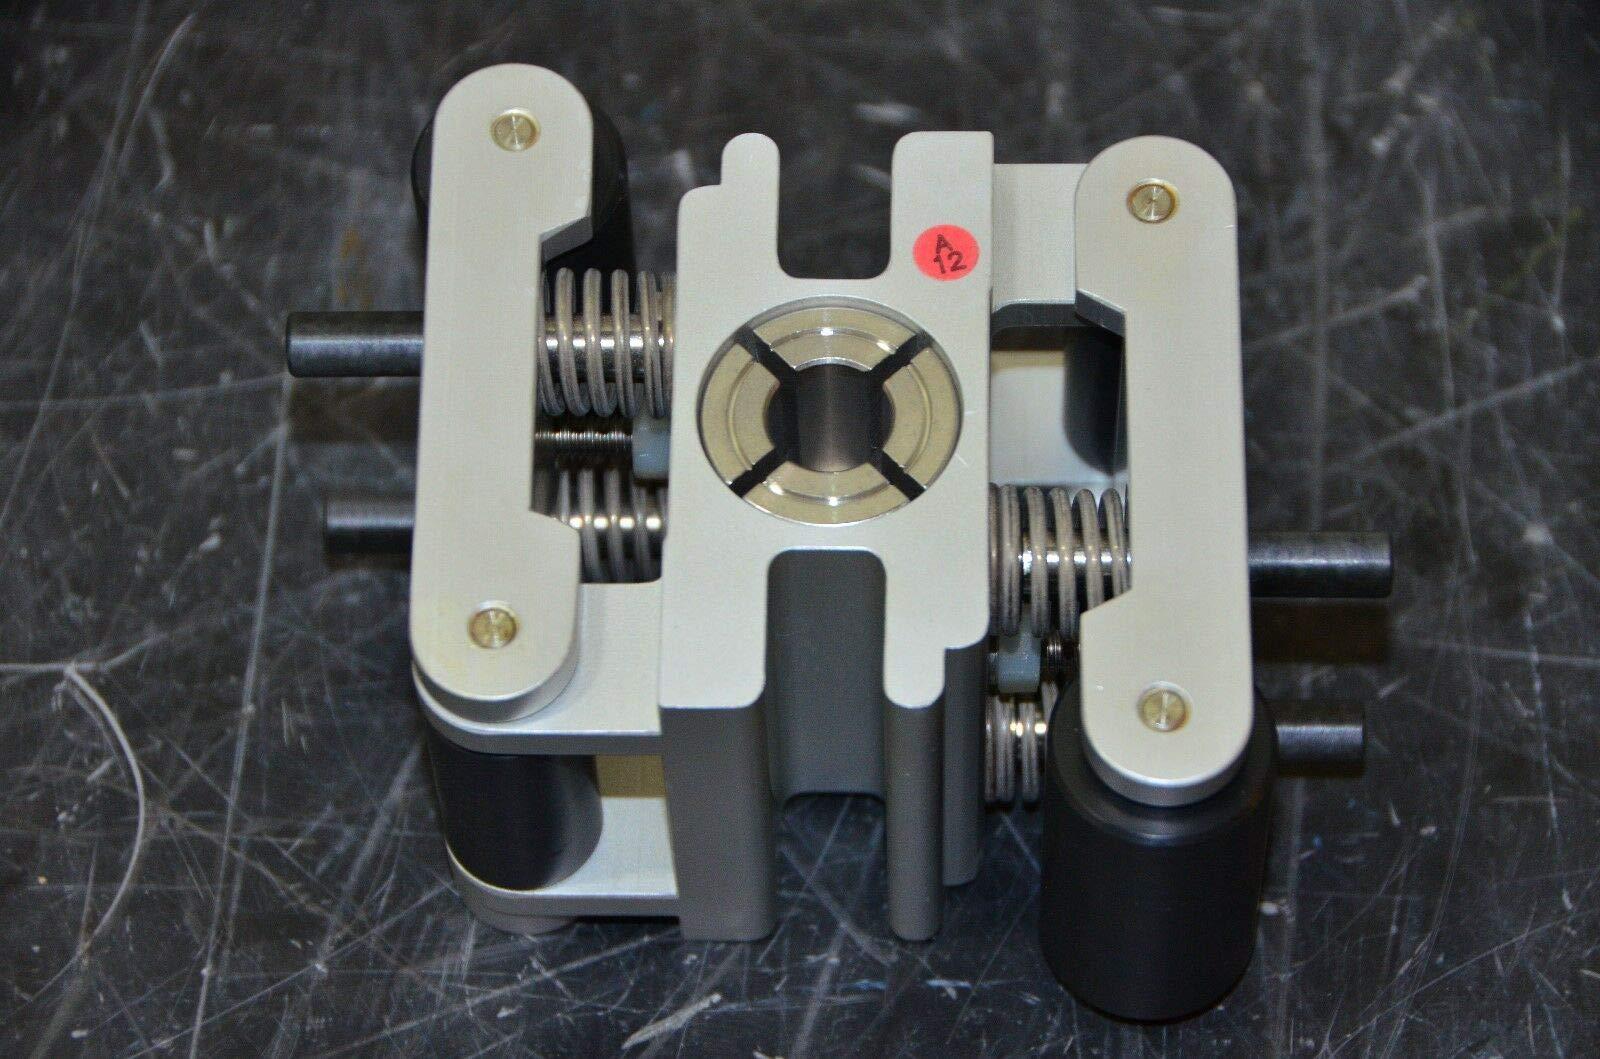 labtechsales Watson Marlow Peristaltic Pump Spring-Loaded Single Channel Pumphead New